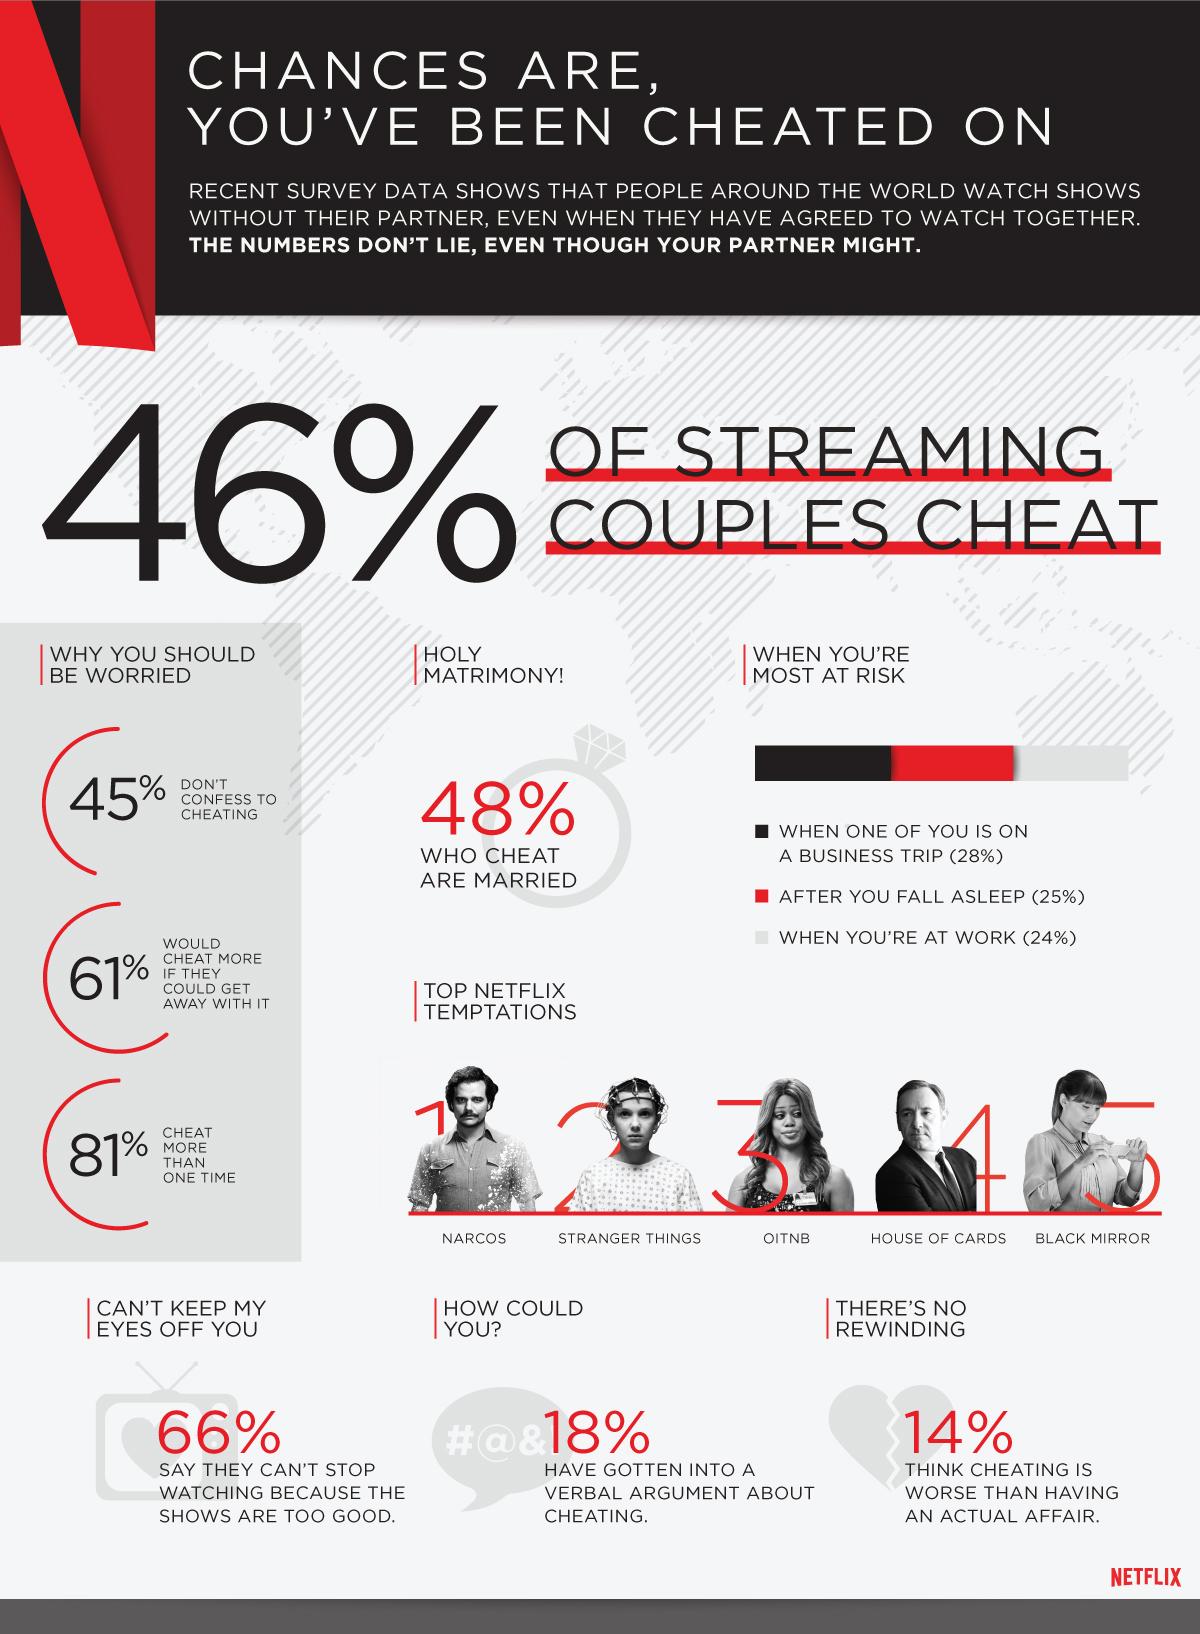 netflix-cheating-infographic